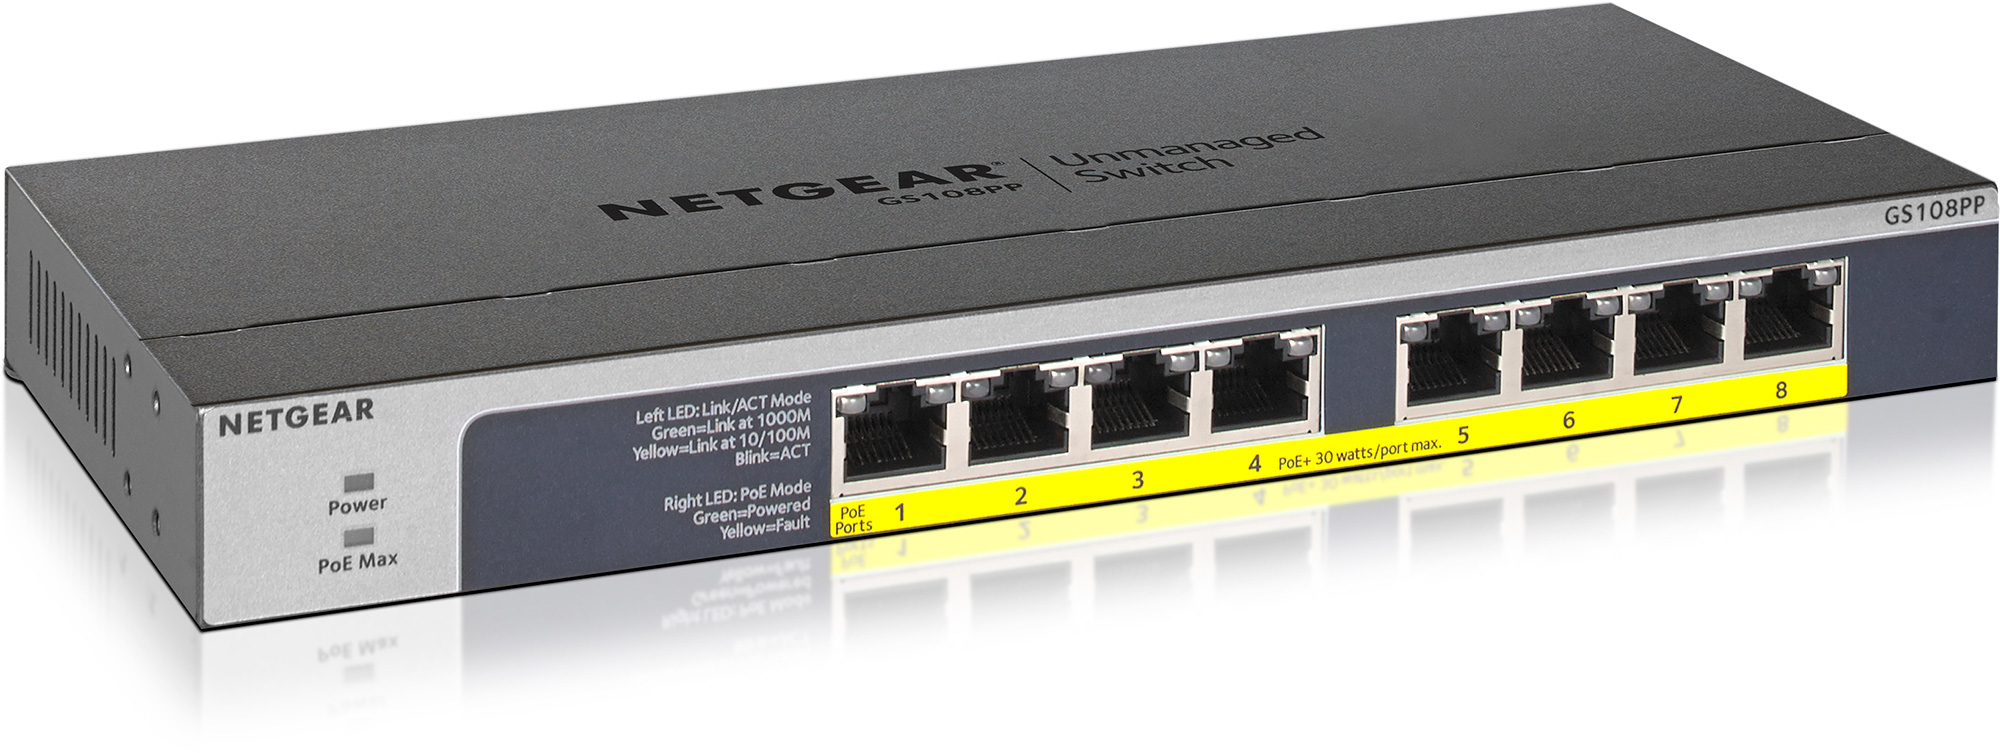 NETGEAR GS108PP-100NAS 8 Port PoE/PoE plus Gigabit Ethernet Unmanaged Switch  GS108PP-100NAS